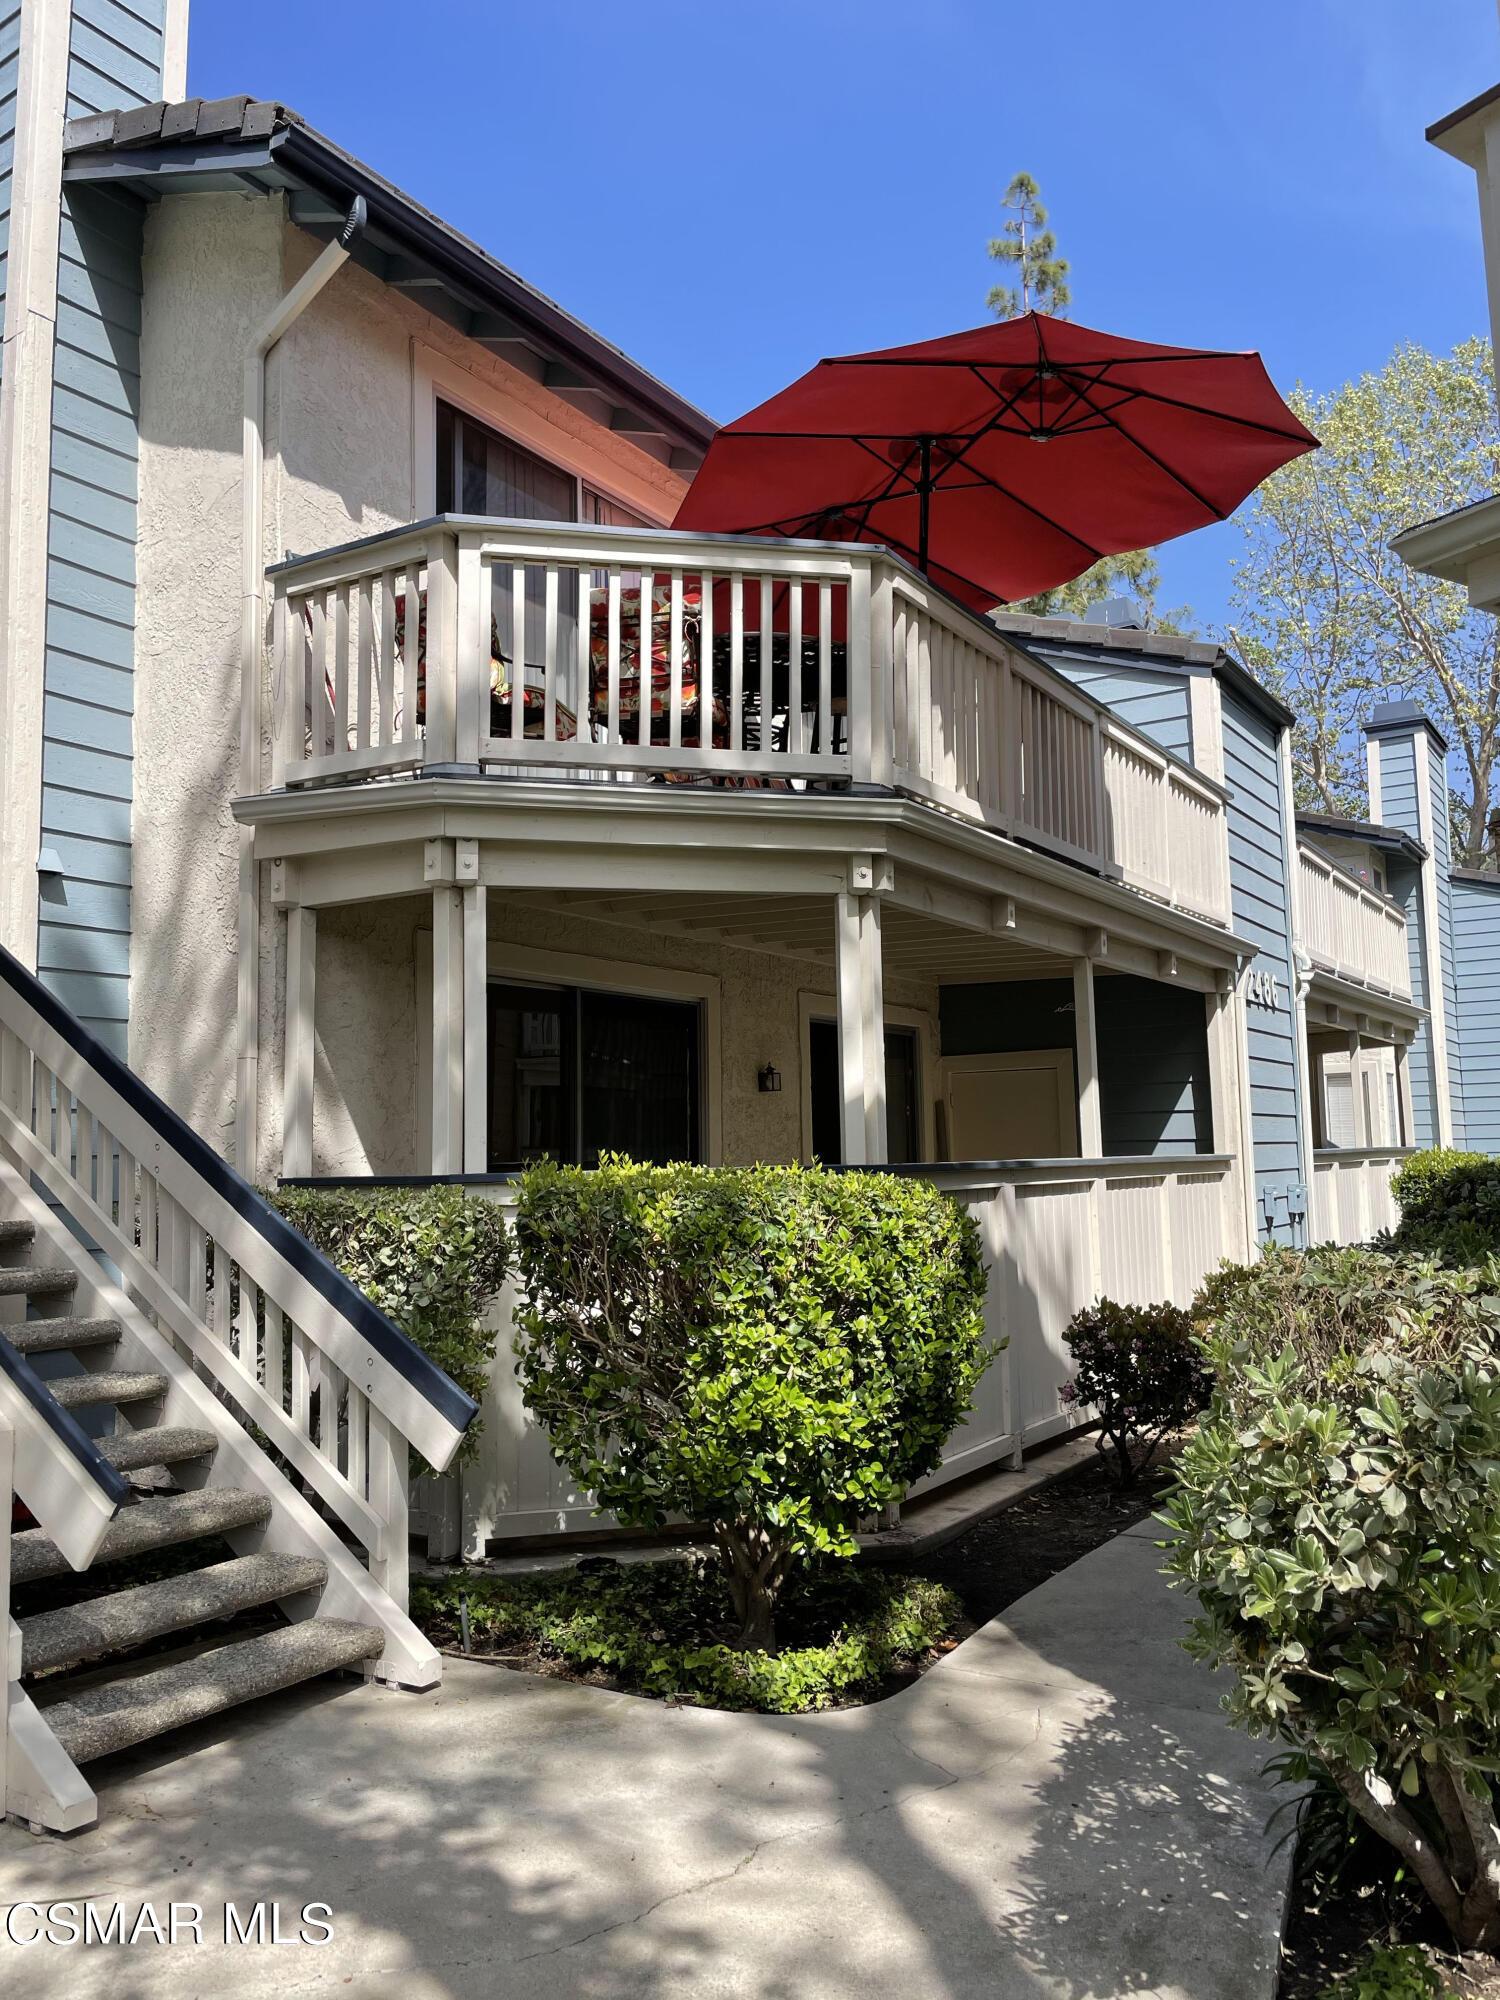 2486 Pleasant Way, Thousand Oaks, California 91362, 1 Bedroom Bedrooms, ,1 BathroomBathrooms,Condominium,For Sale,2486 Pleasant Way,1,221001884